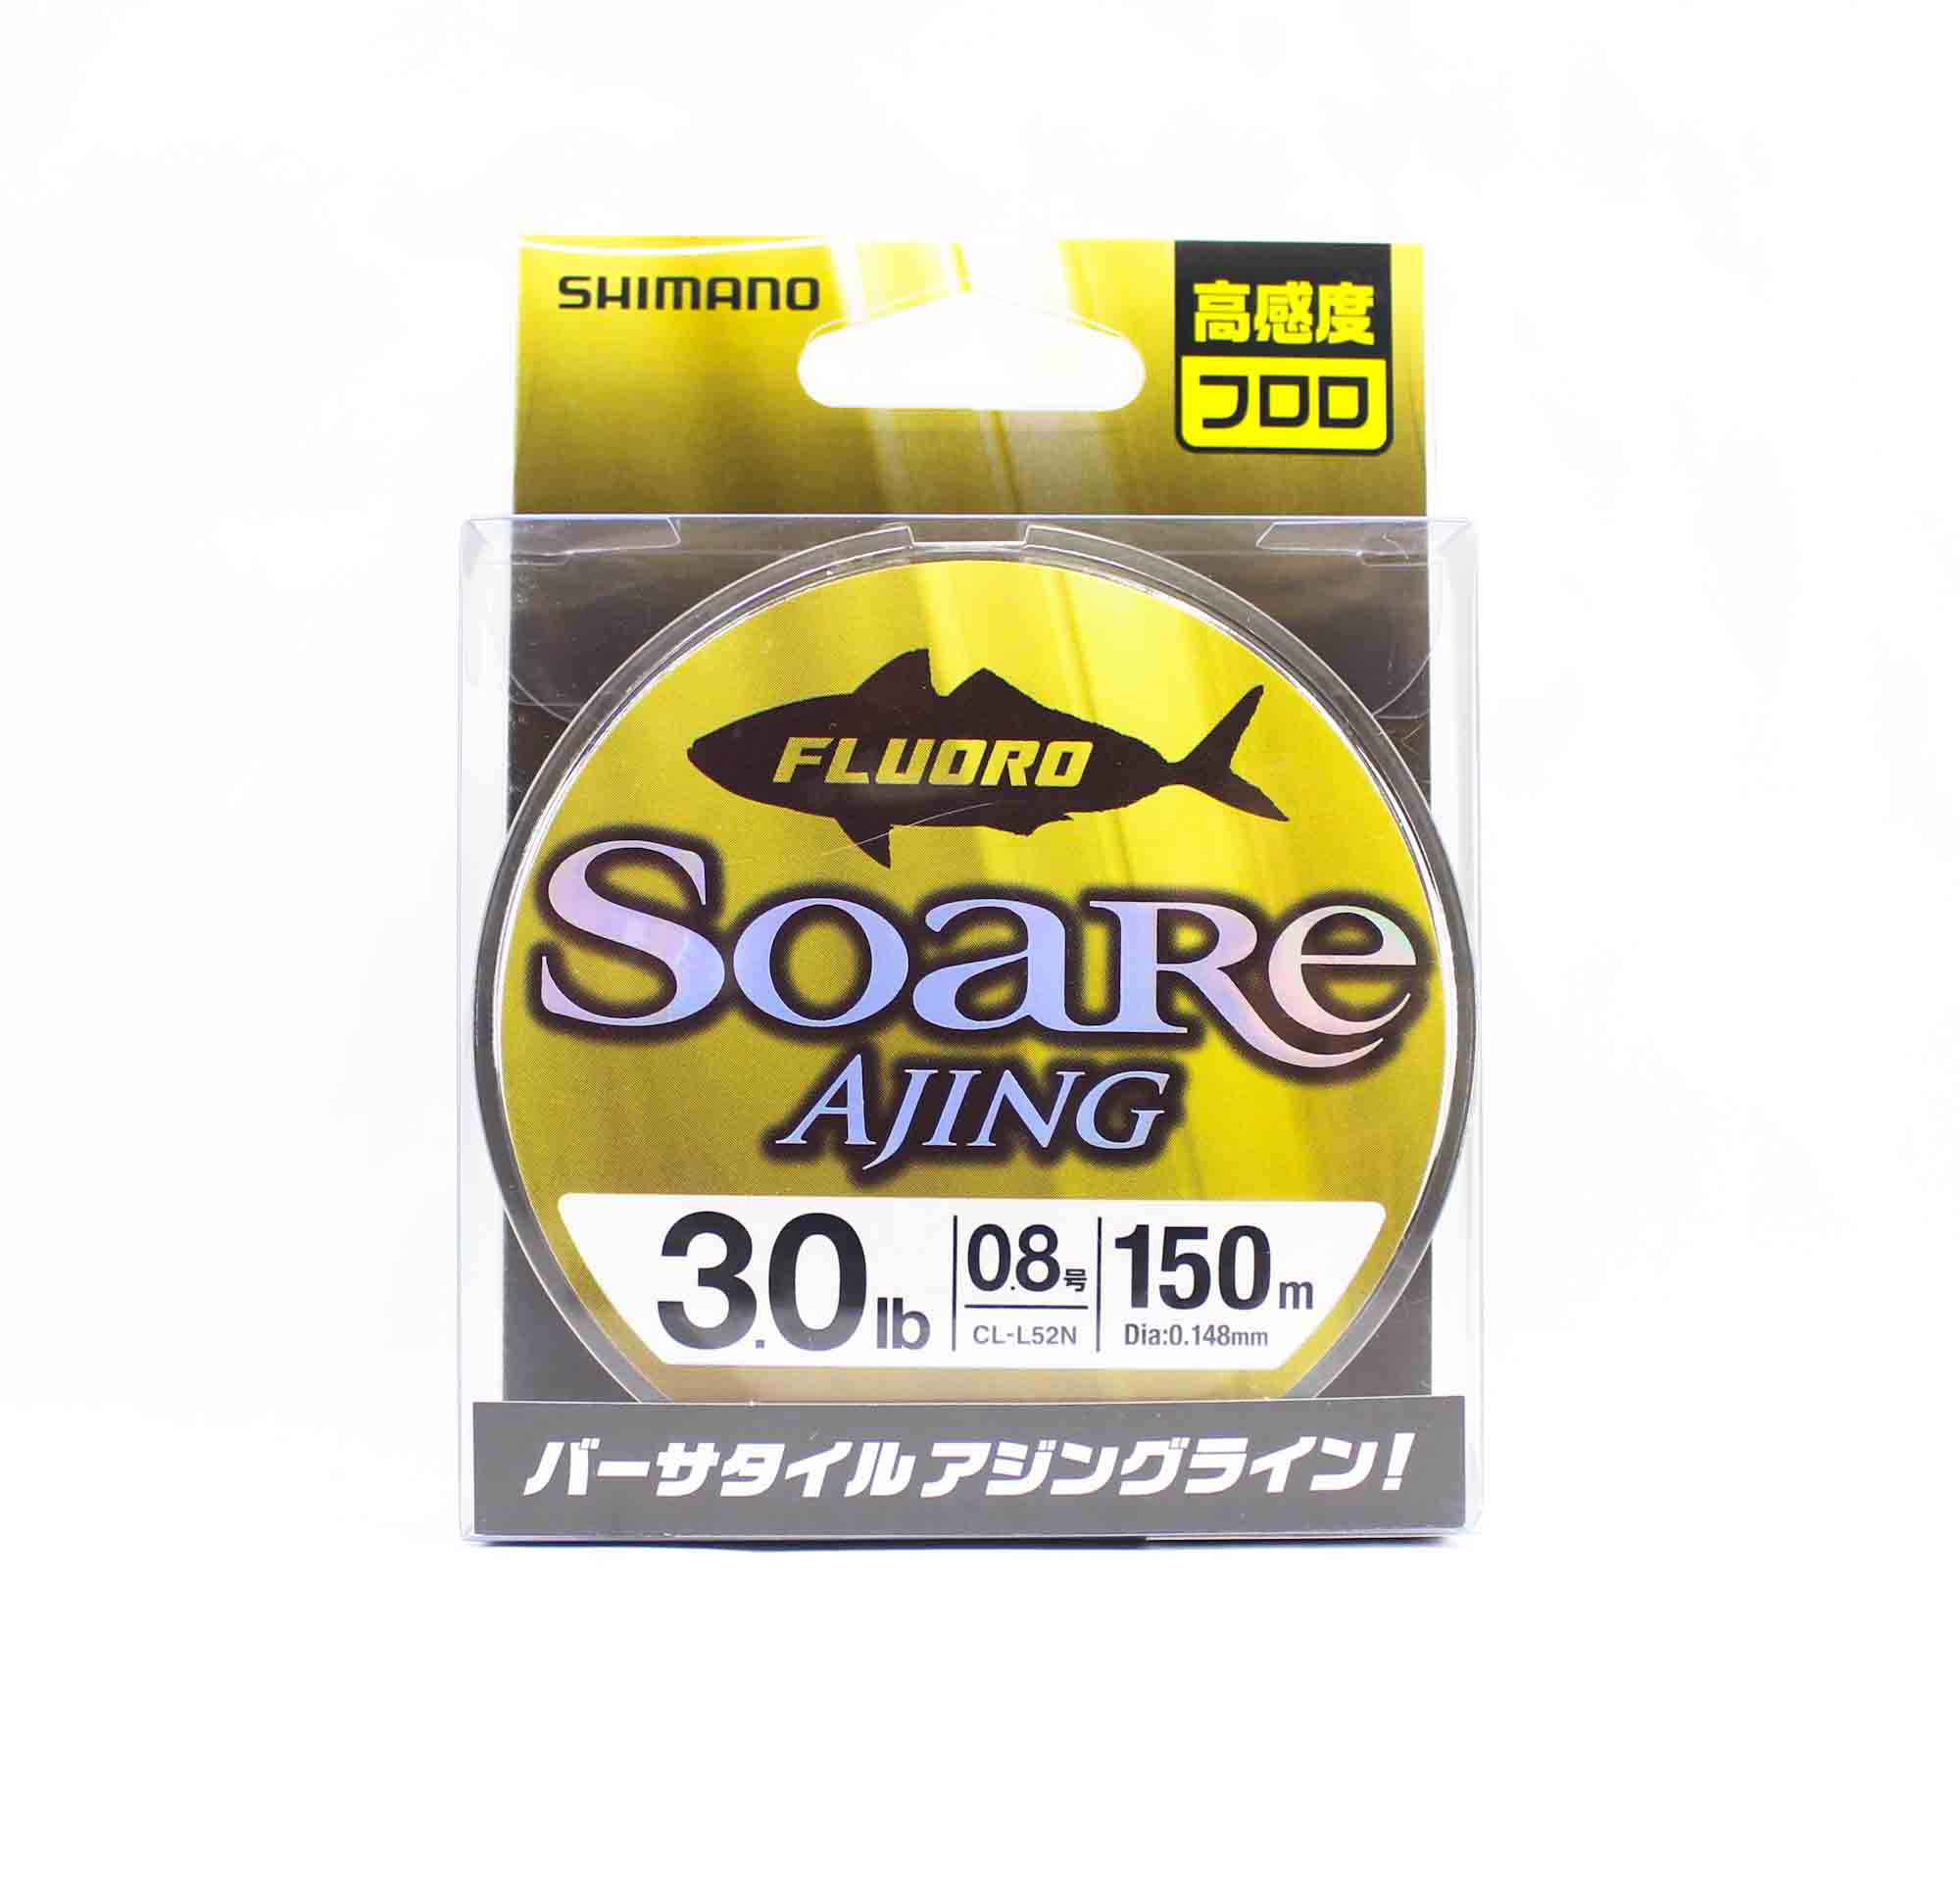 Shimano CL-52N Soare Ajing Fluorocarbon Line 150m Size 0.8 3.0lb 442642